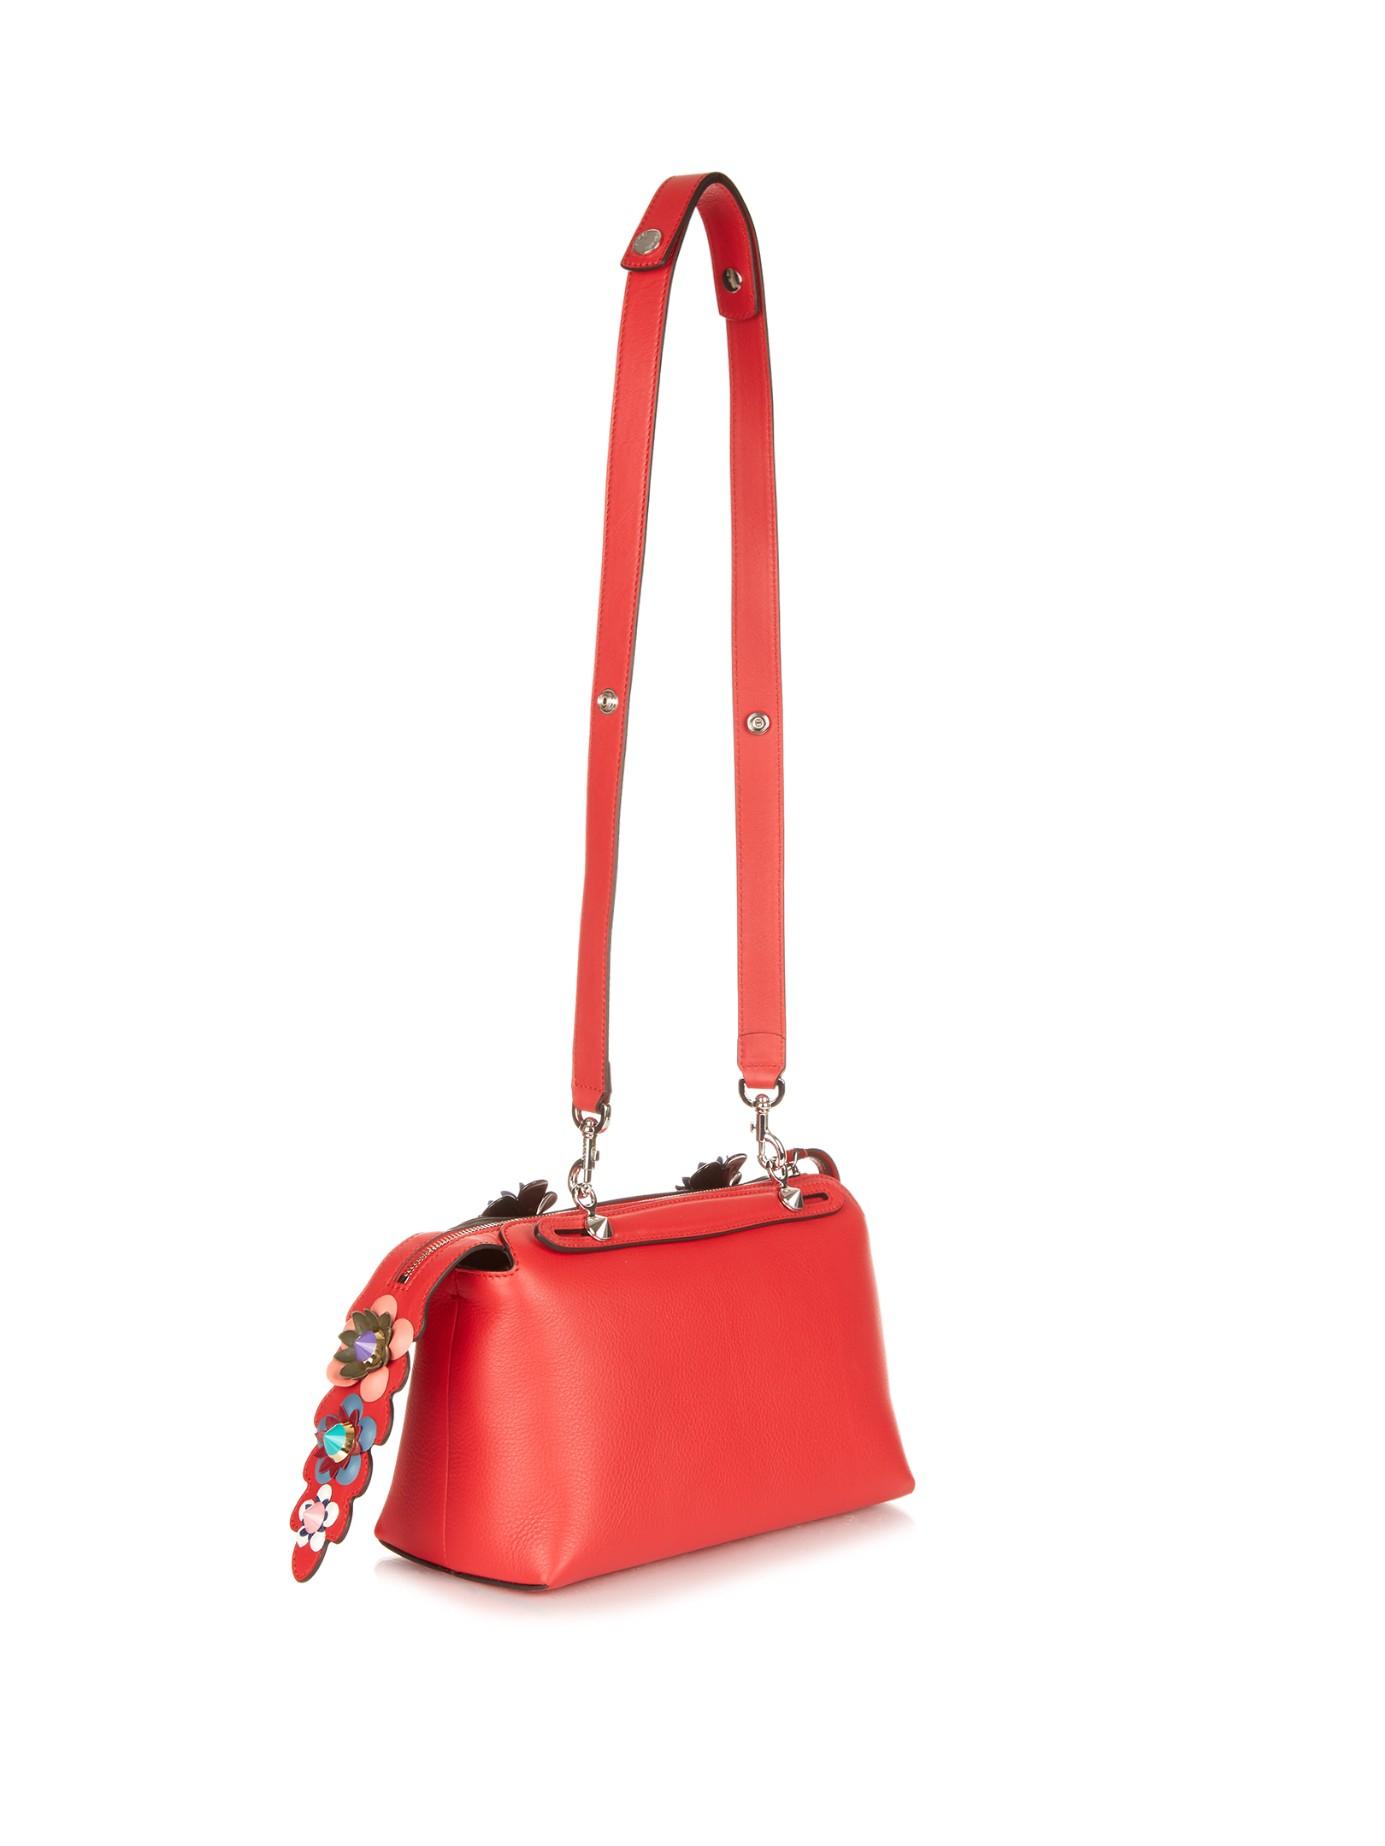 Fendi Bag Red Strap